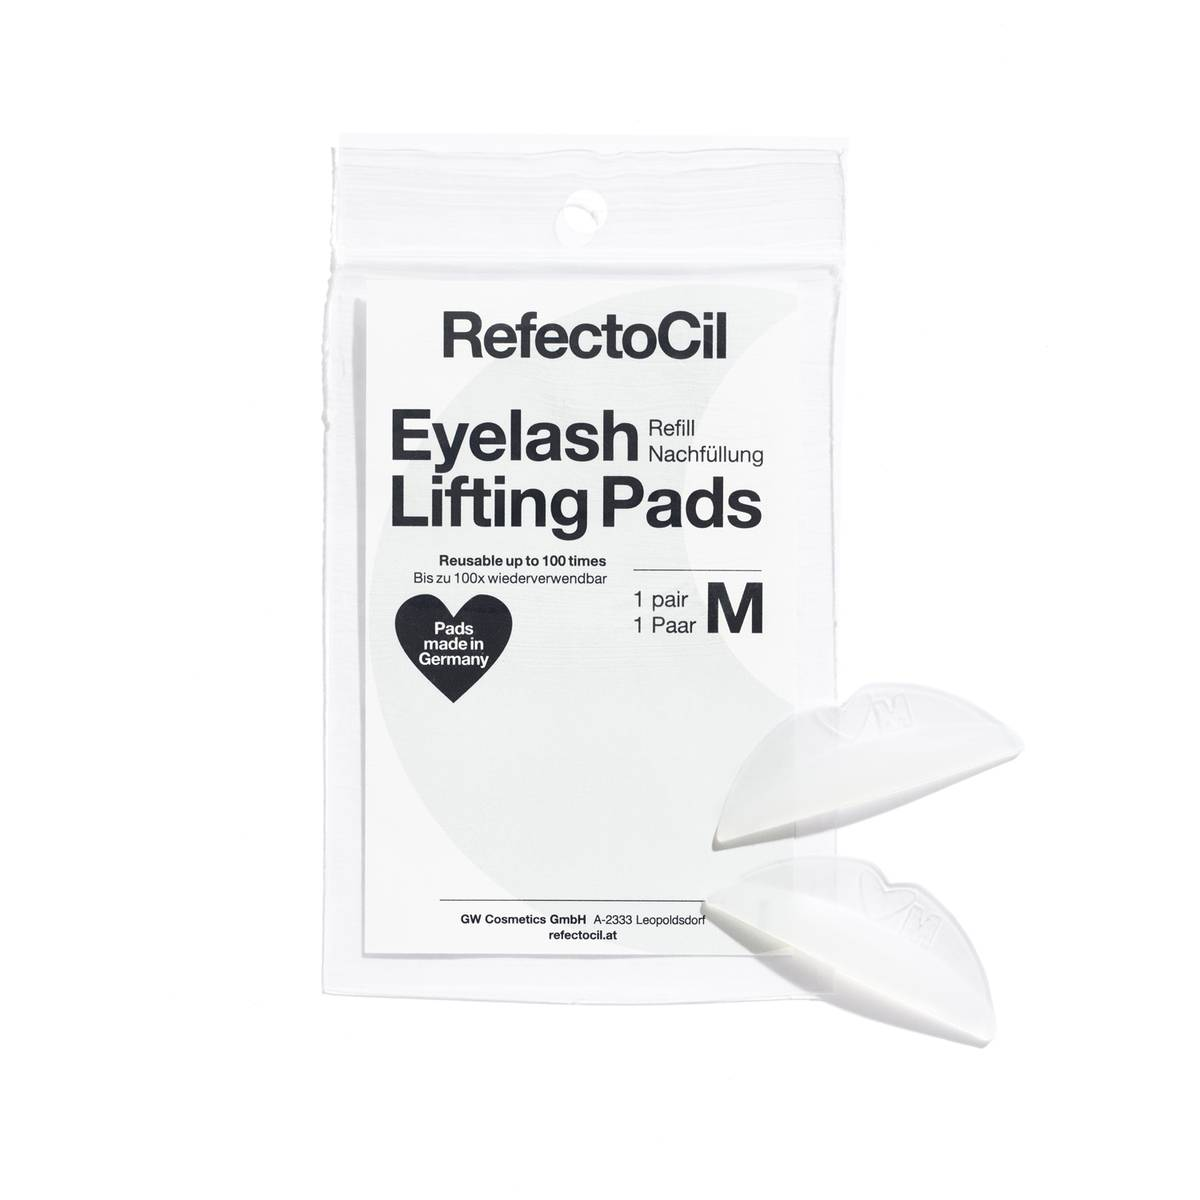 RefectoCil Eyelash Lift Pads